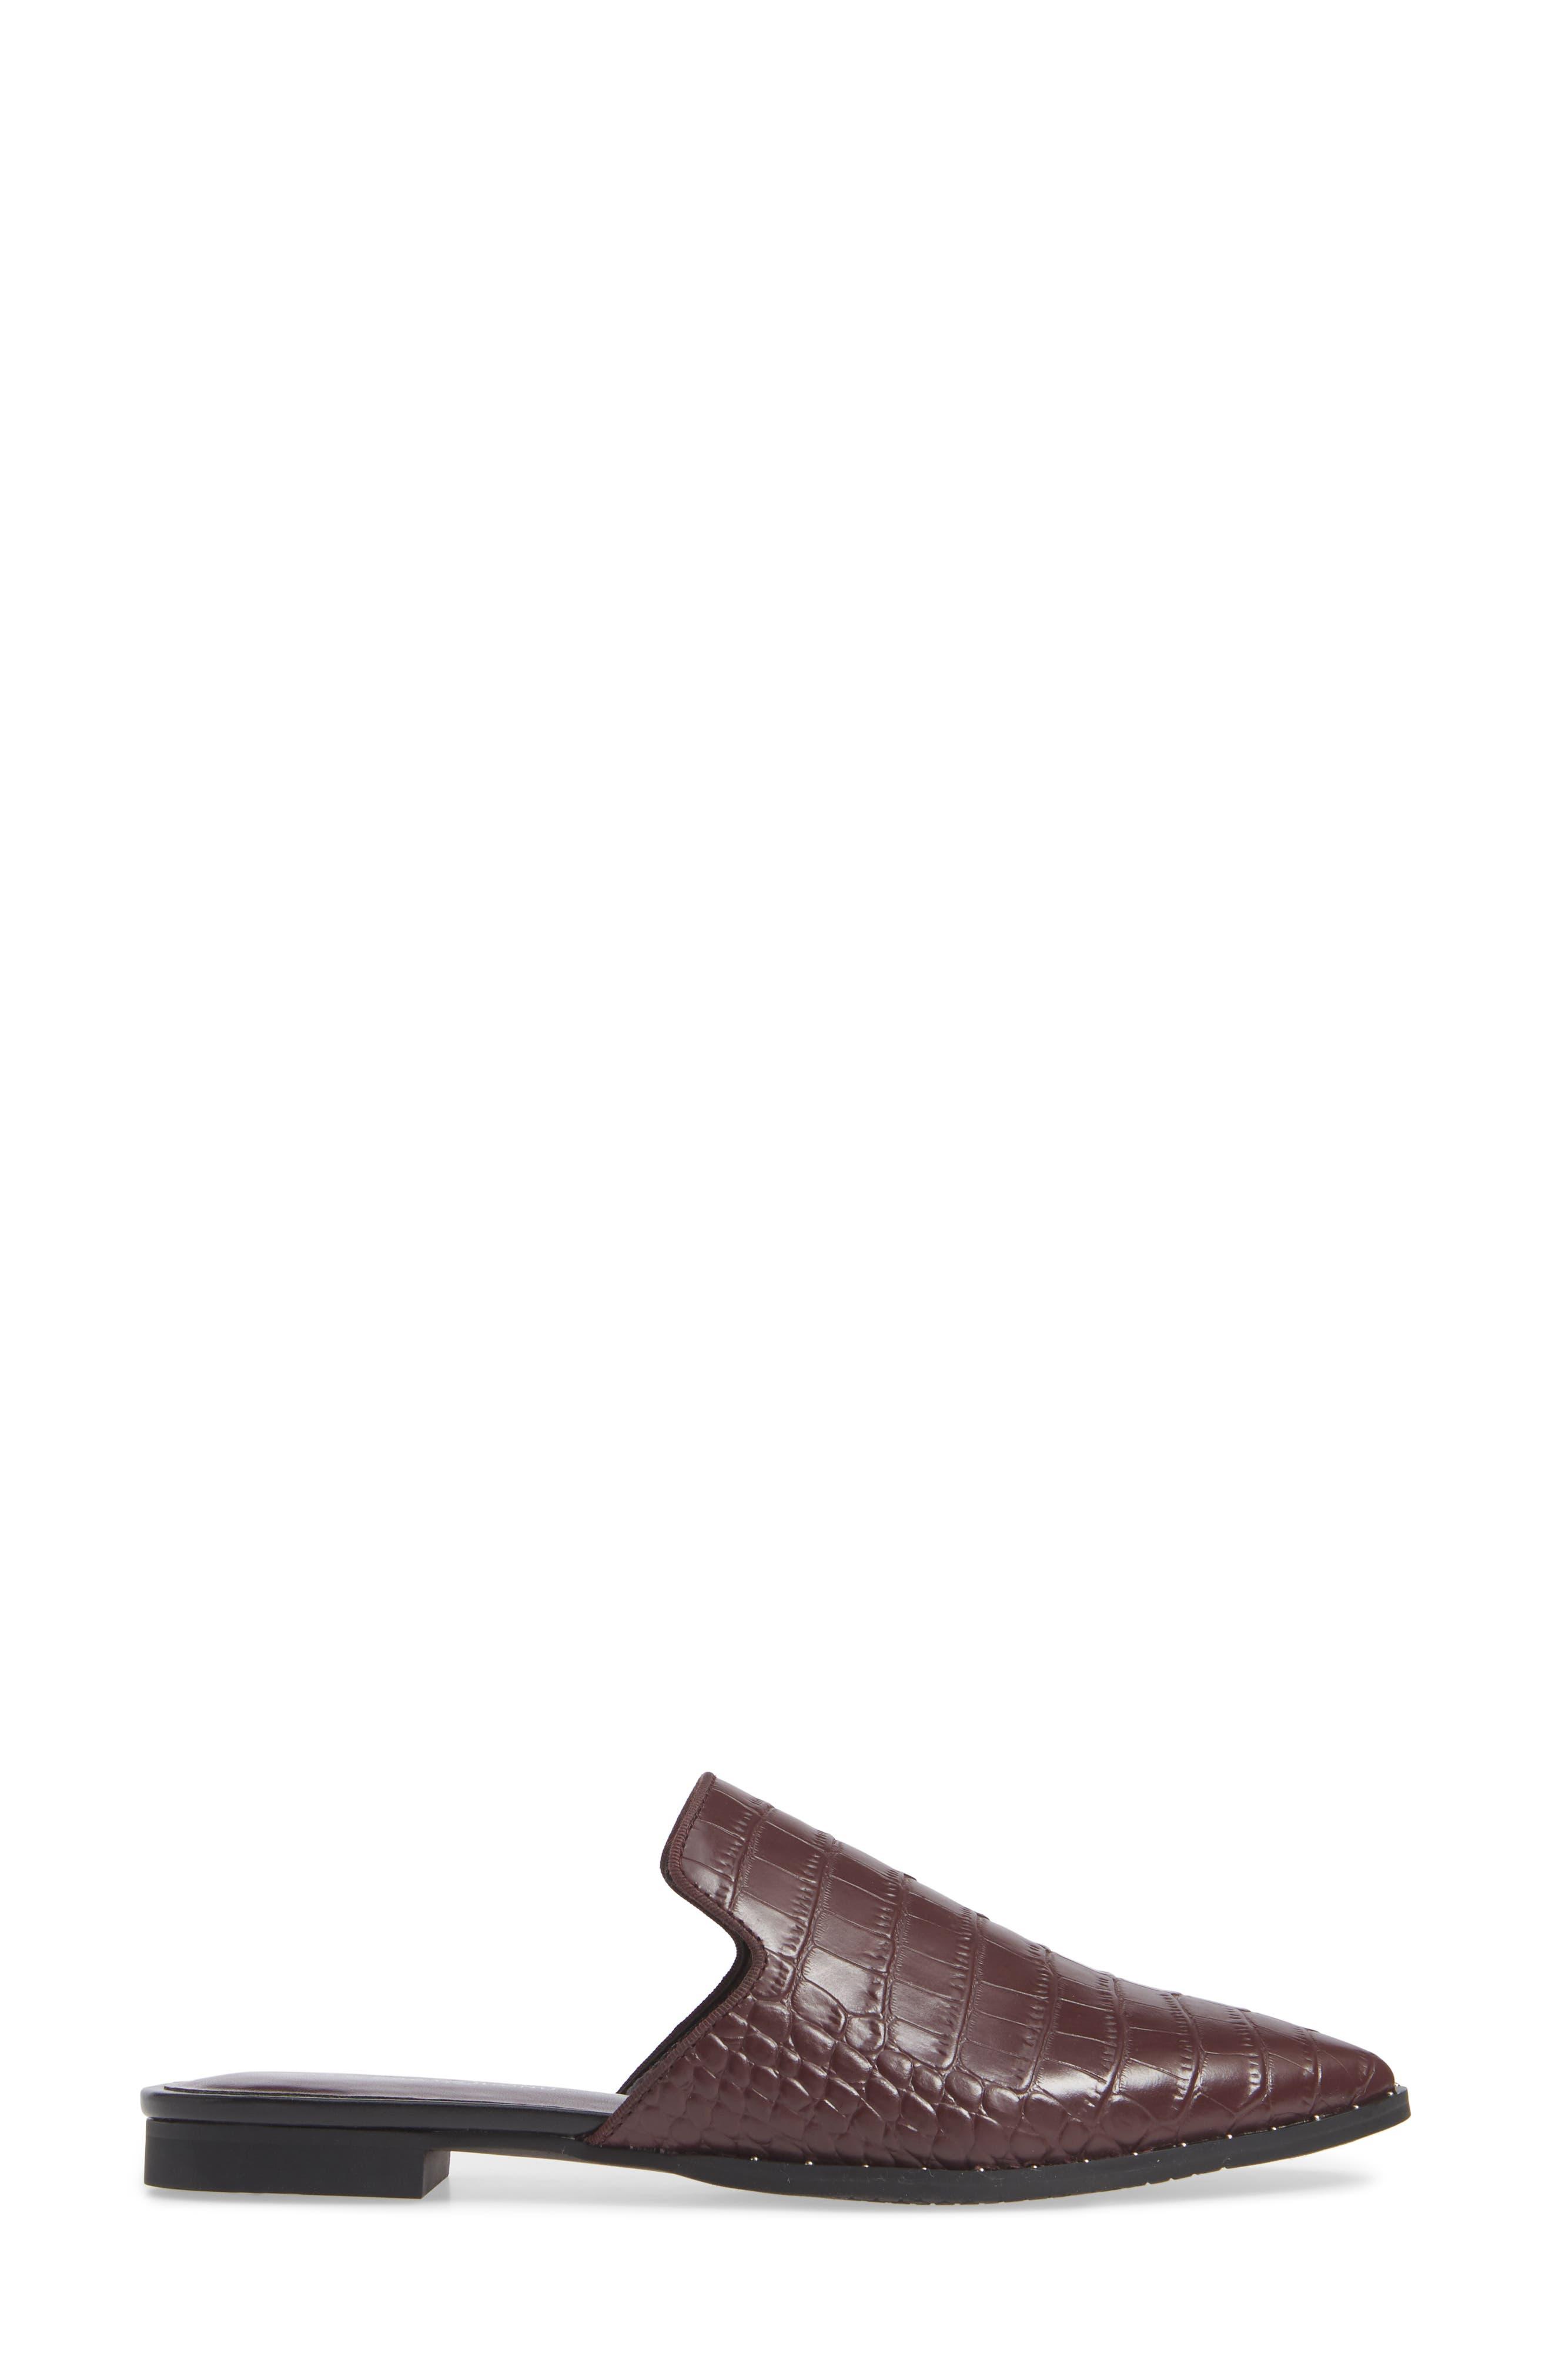 Keaton Loafer Mule,                             Alternate thumbnail 3, color,                             BURGUNDY EMBOSSED CROC